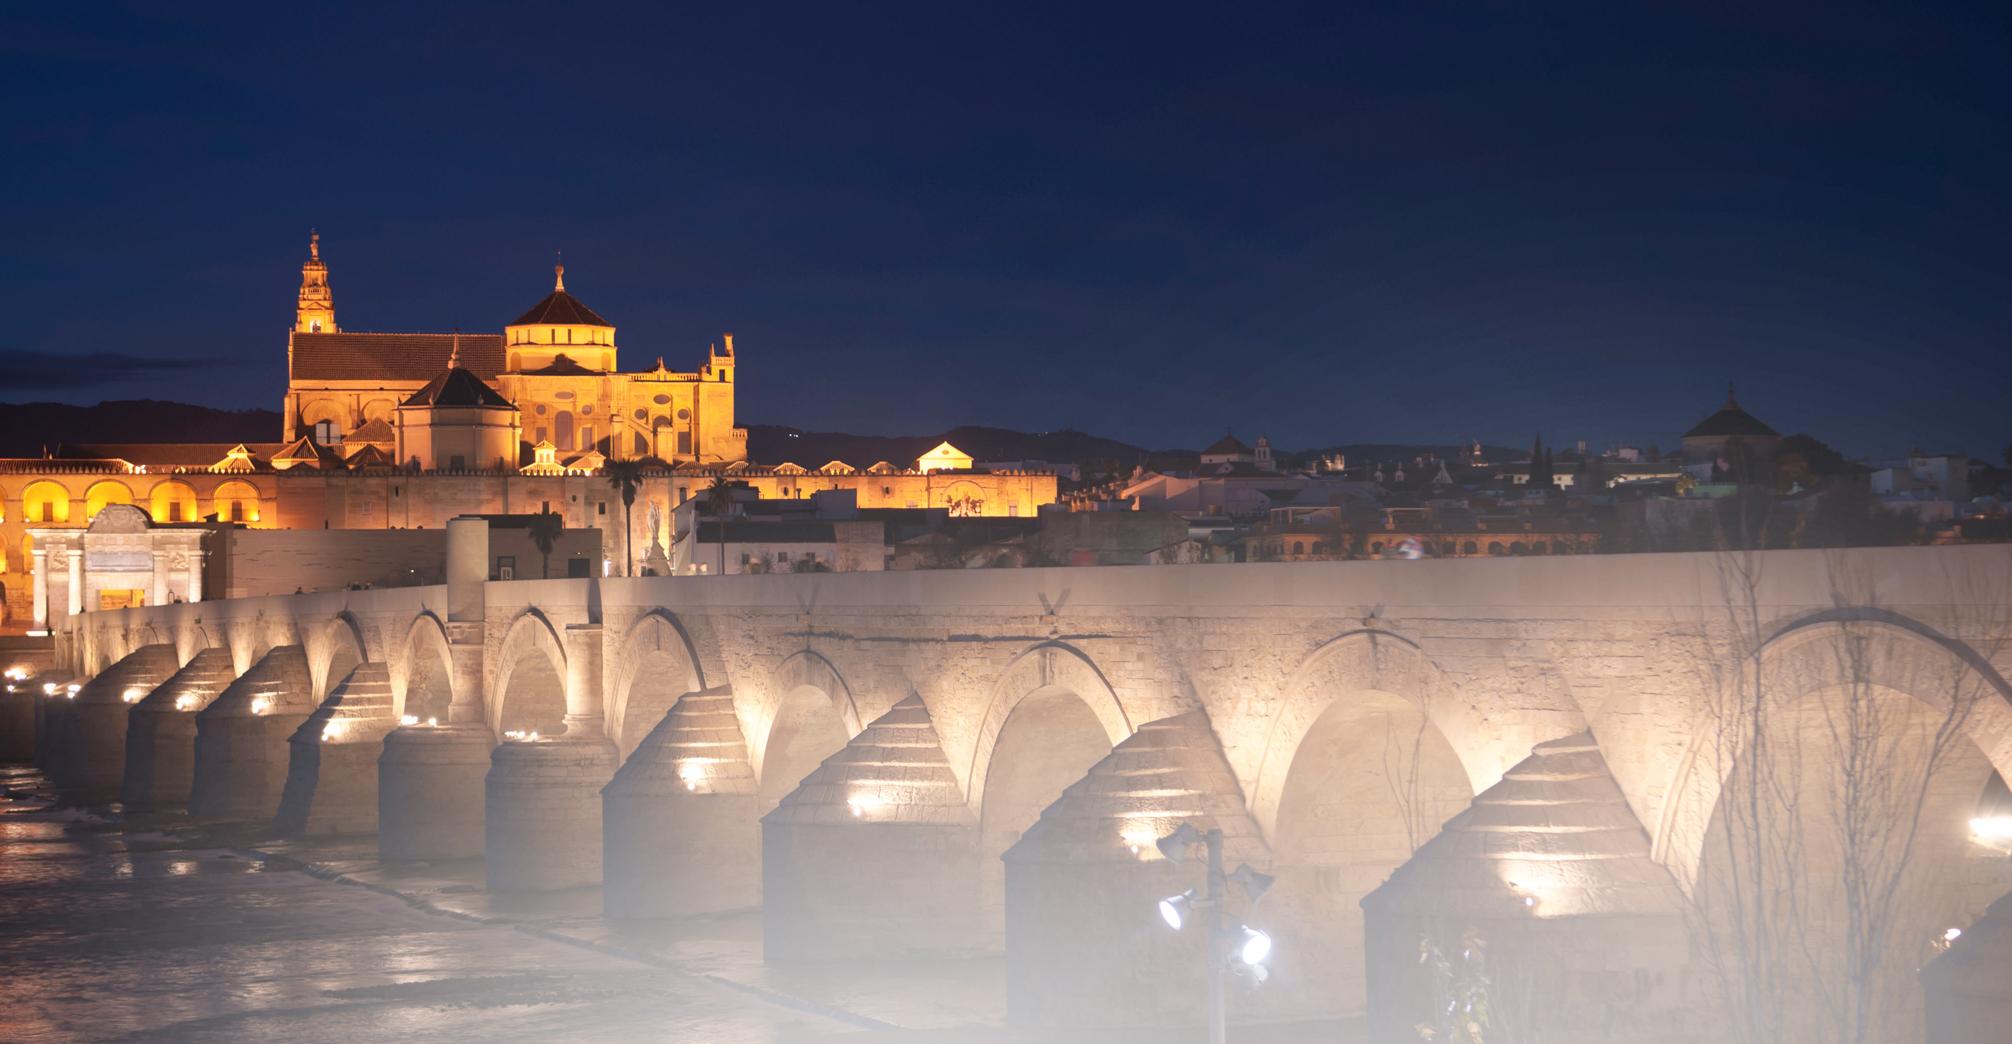 Spain.Cordoba.Puente-romano.EuroSpain-Travel